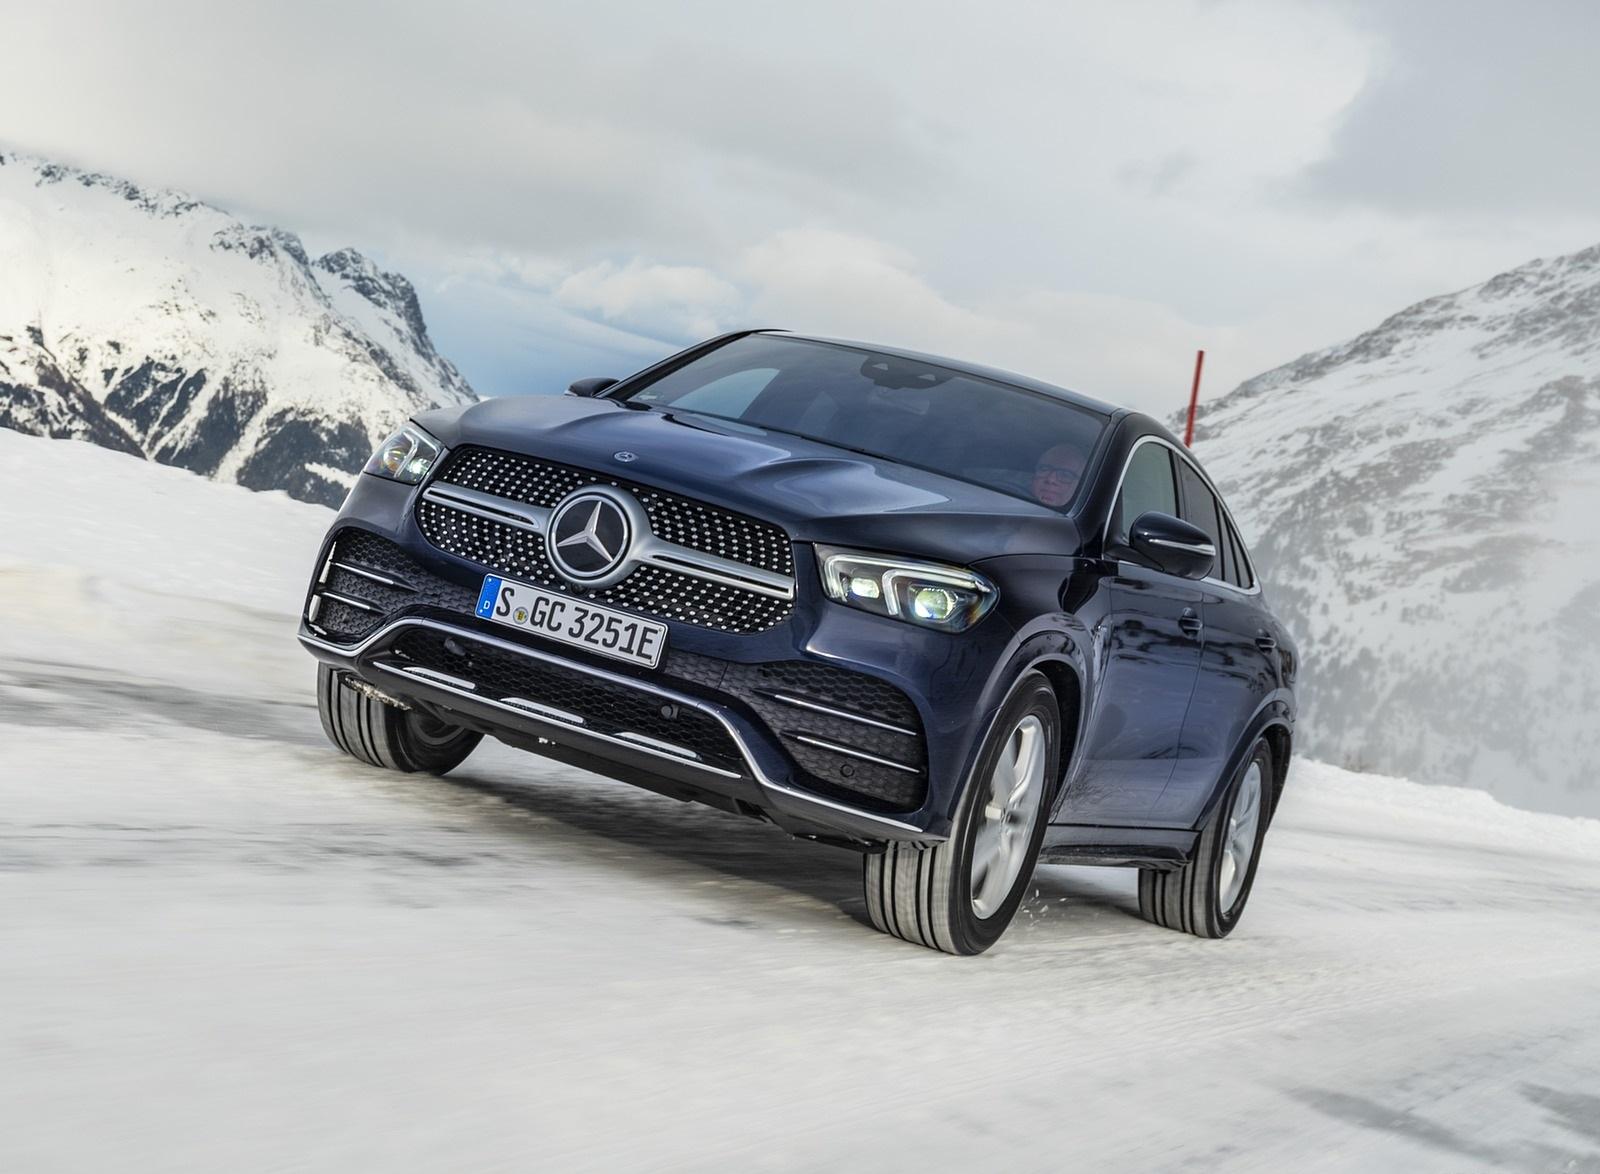 2021 Mercedes-Benz GLE Coupe 350 de 4MATIC Coupe (Color: Cavansite Blue Metallic Diesel Plug-In Hybrid) Front Three-Quarter Wallpapers (7)